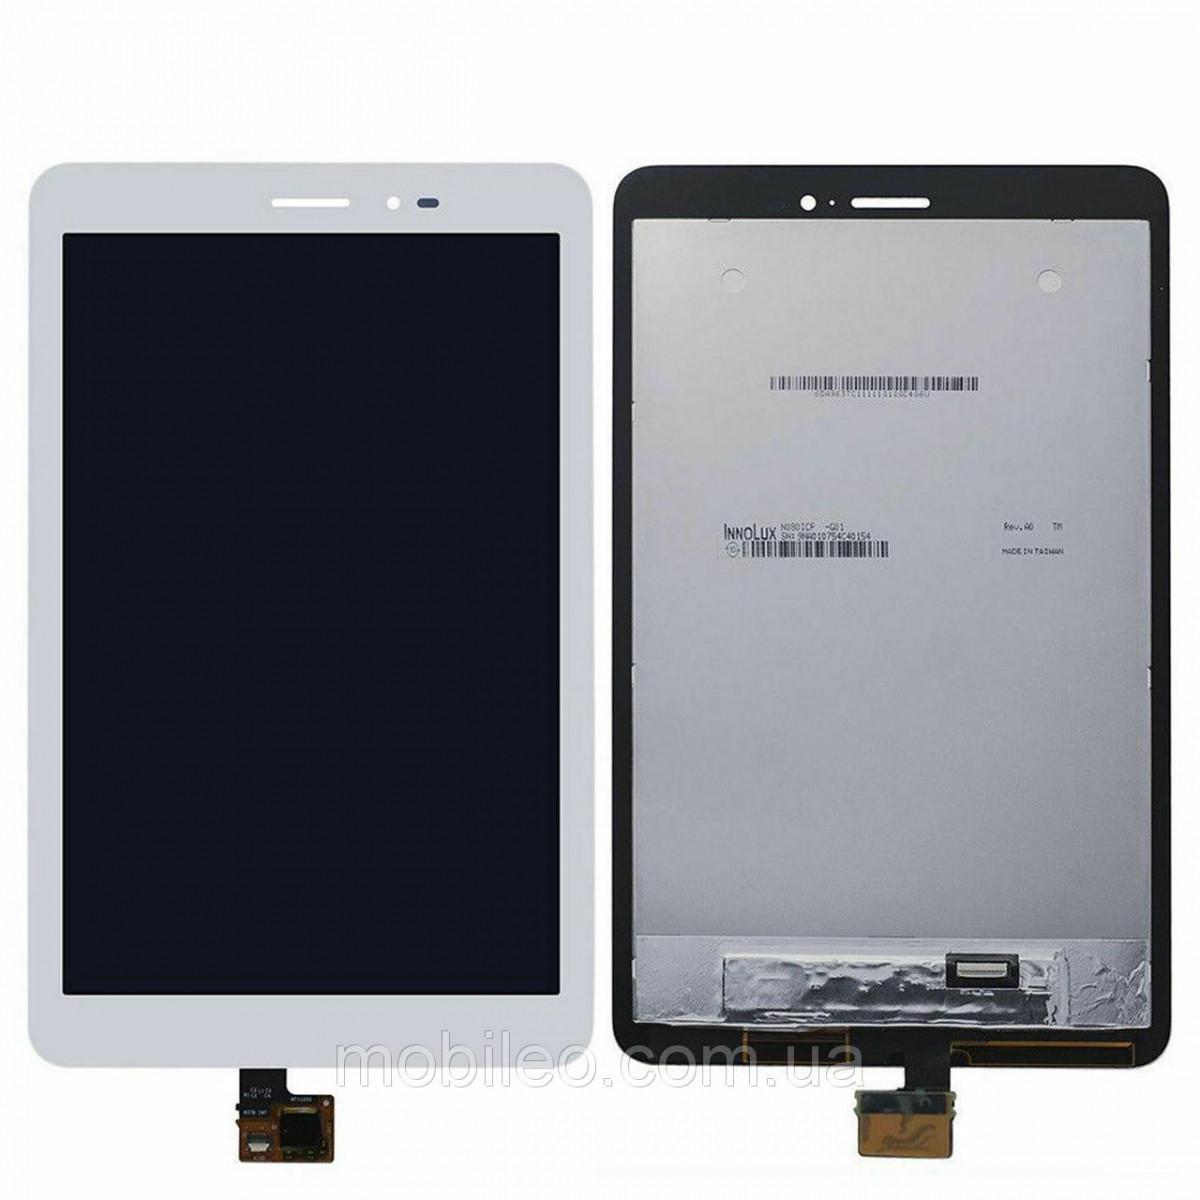 Дисплей (LCD) Huawei планшет MediaPad T1 7.0 (T1-701u) с тачскрином, белый